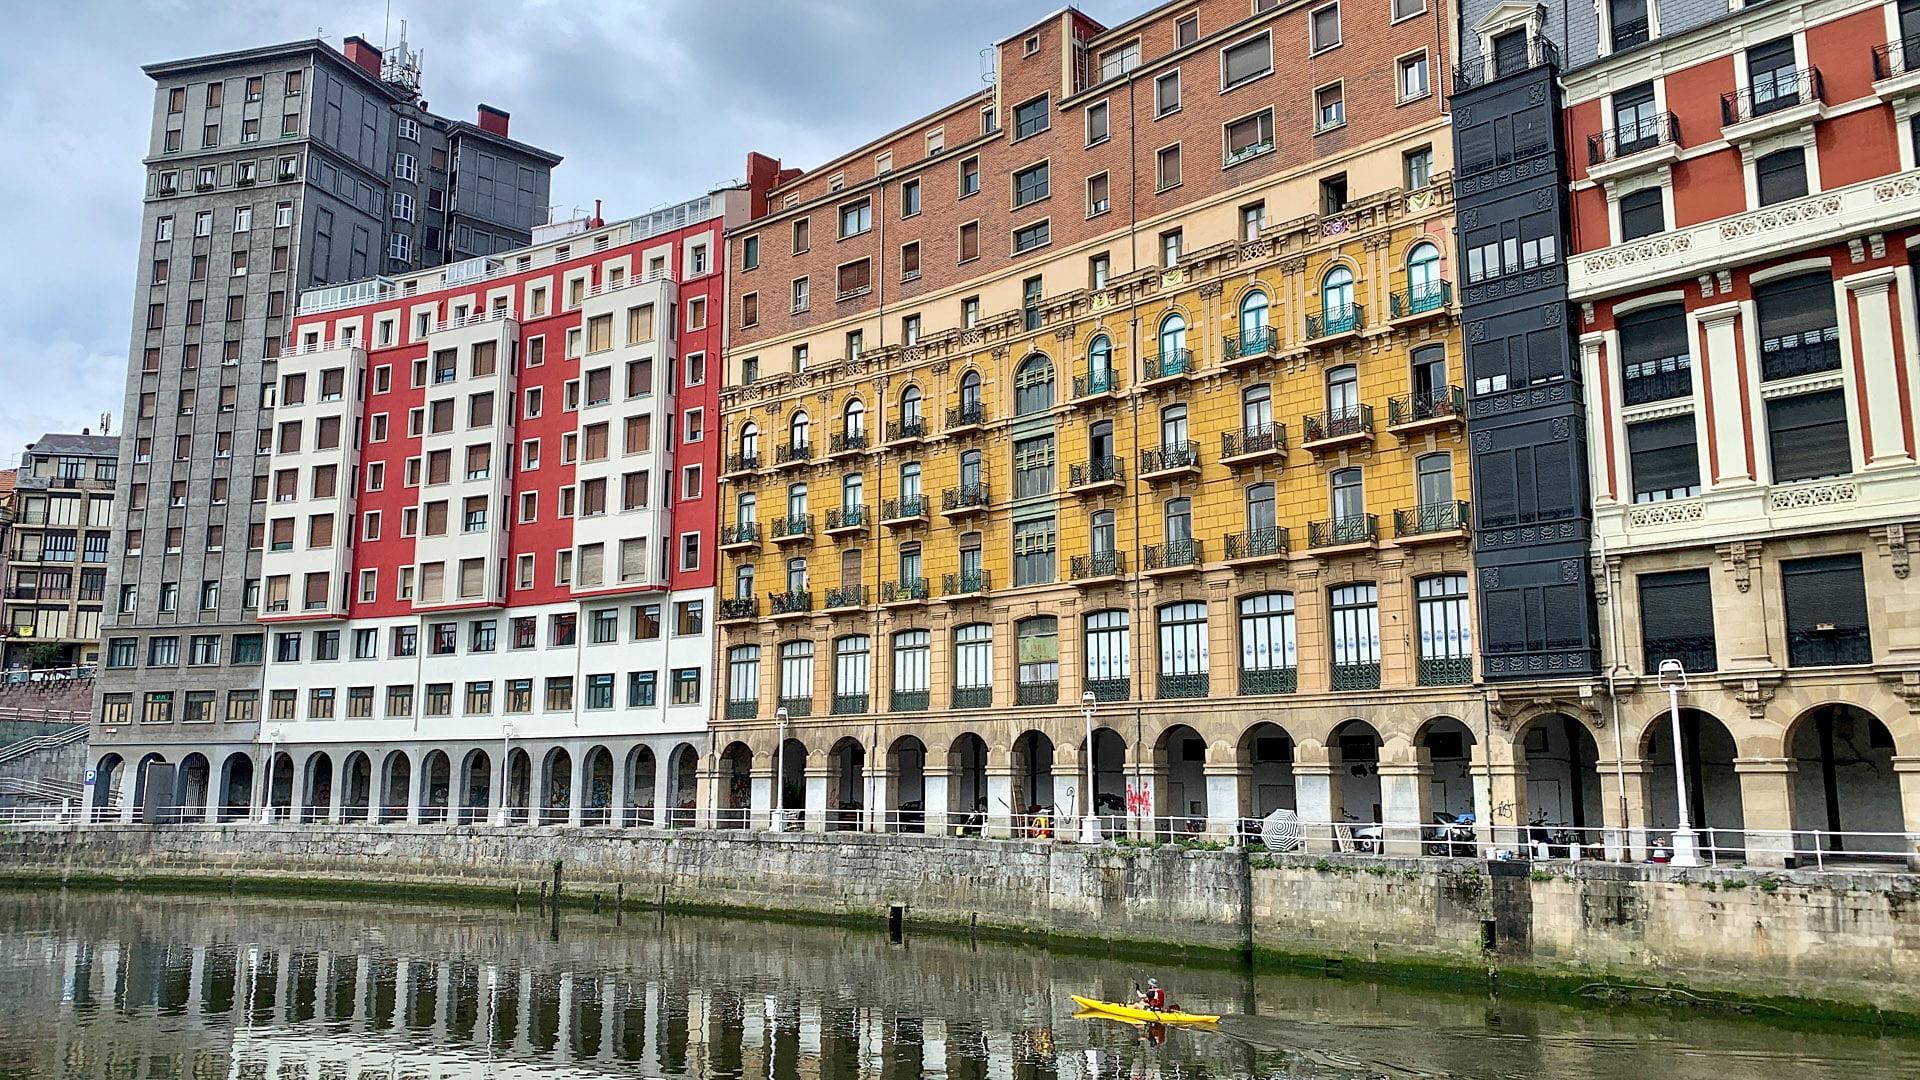 Bilbao – Lekker shoppen in Mercado de la Ribera en het oude centrum